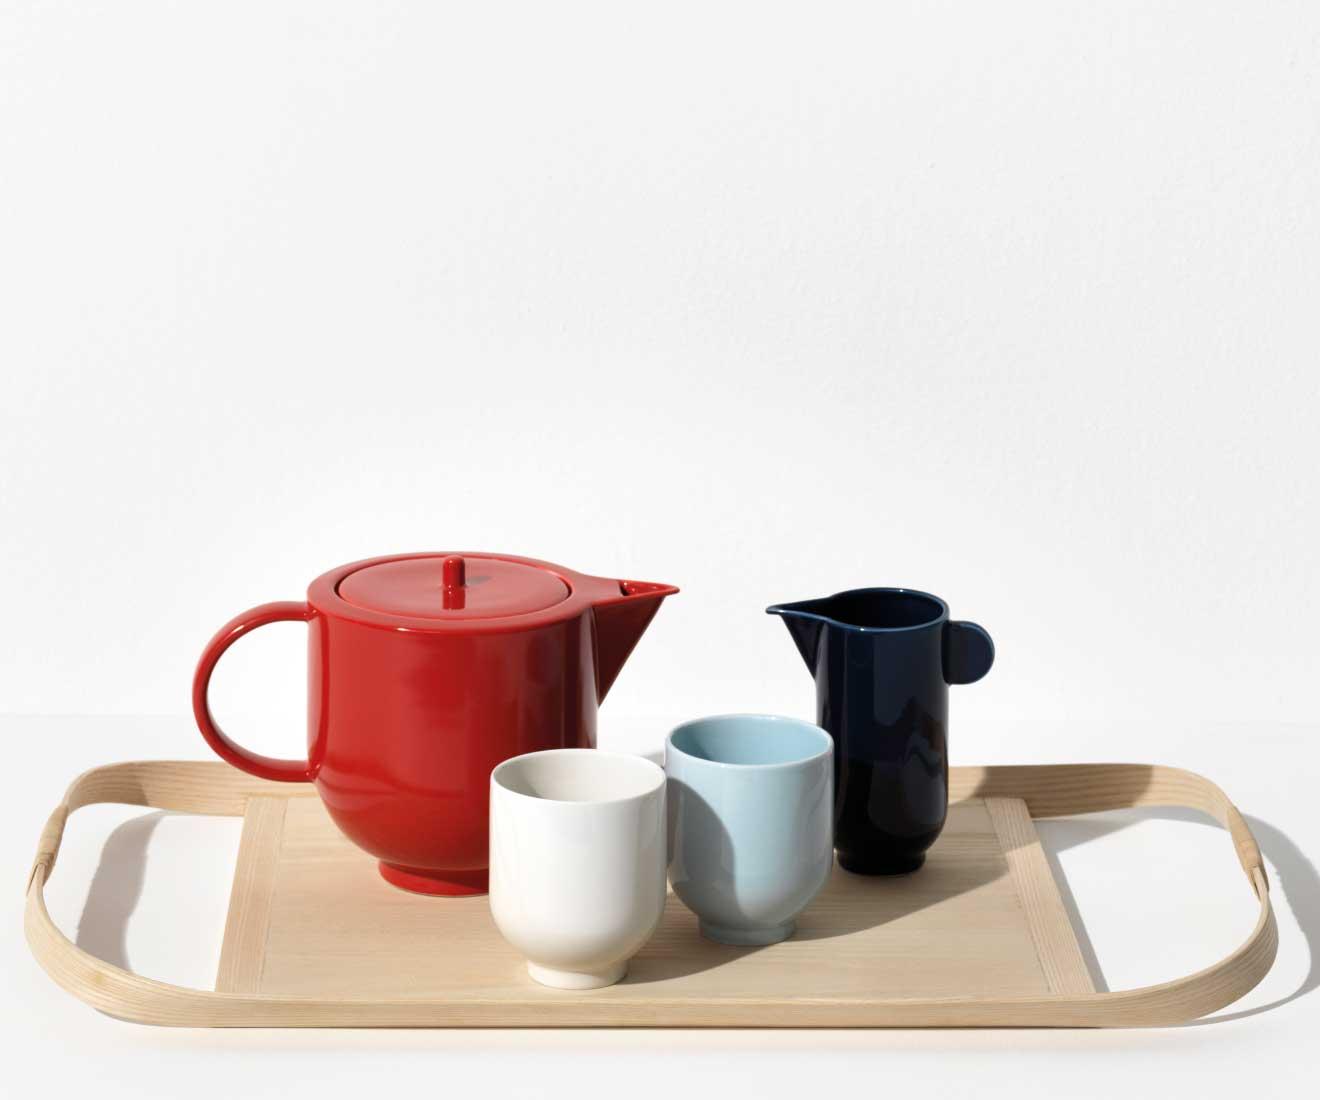 Interior photo of Motarasu designs - Yoko tea pot in red, pitcher in blue, Light blue and white mug by Stilleben - Union Tray by Masuko Unayama